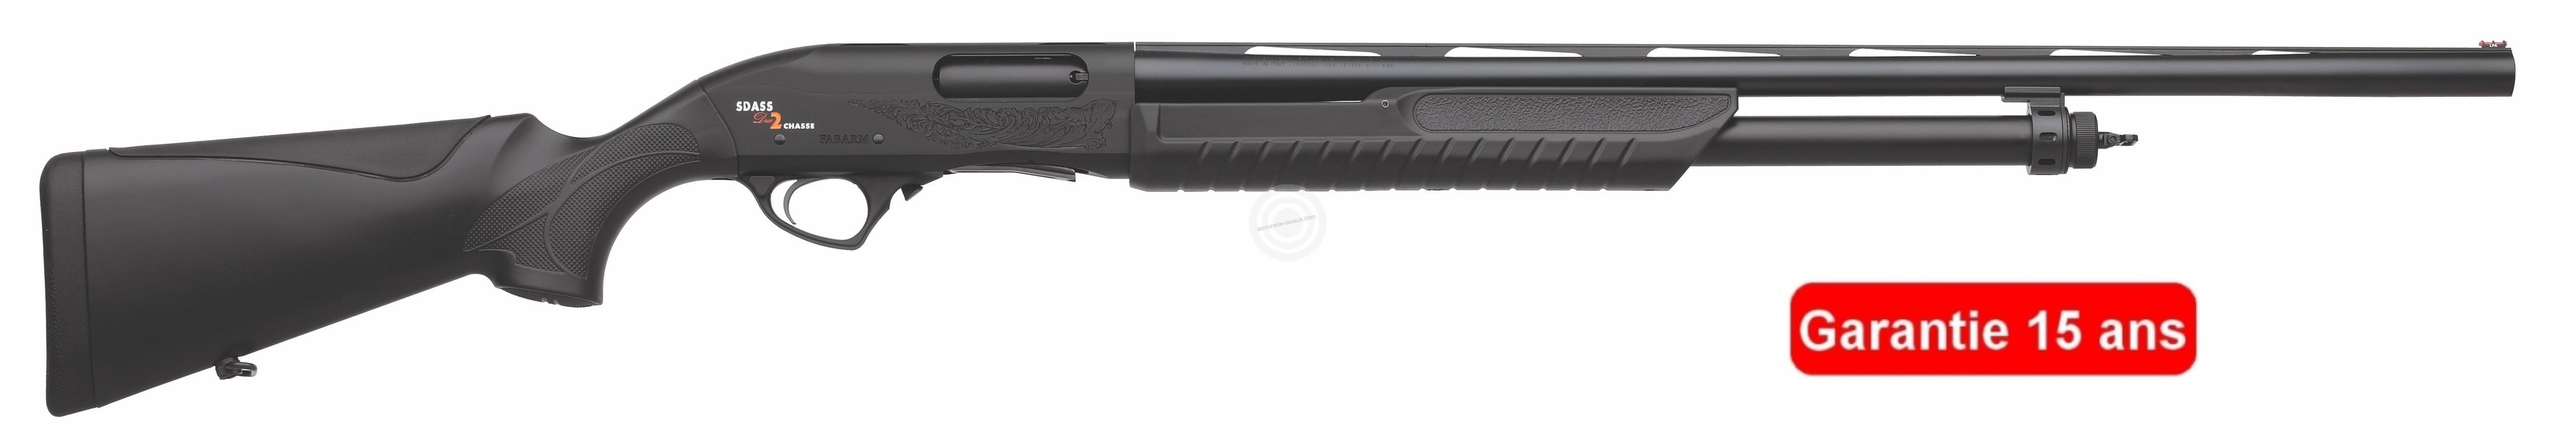 Fusil à pompe FABARM SDASS Compo Chasse cal.12/76 (canon de 71cm)